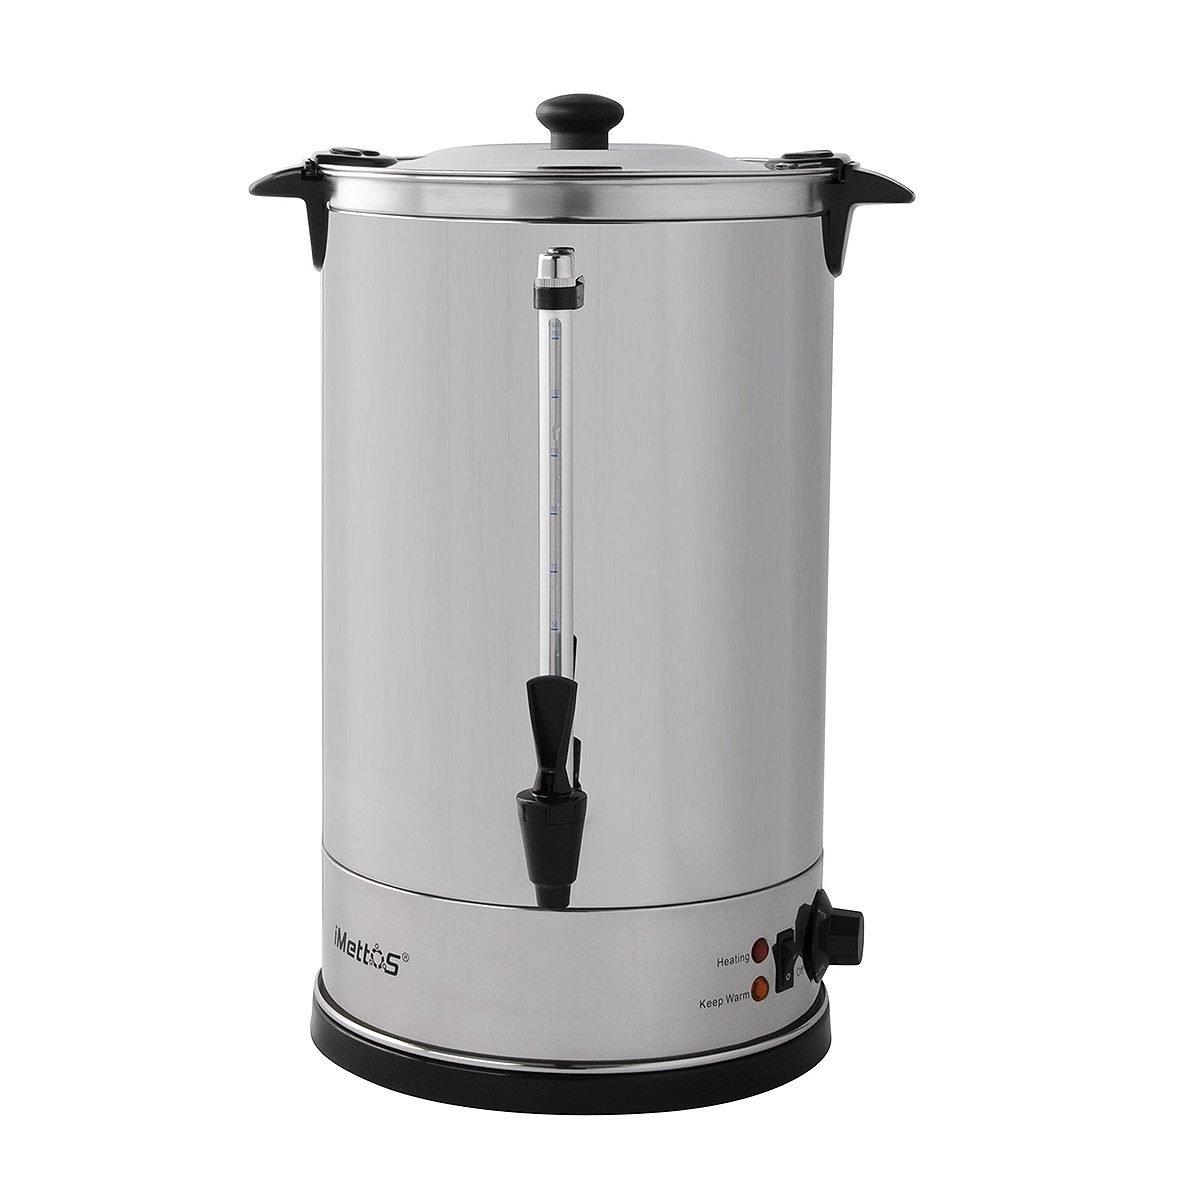 New Imettos 501003 20 Ltr Water Boiler For Sale